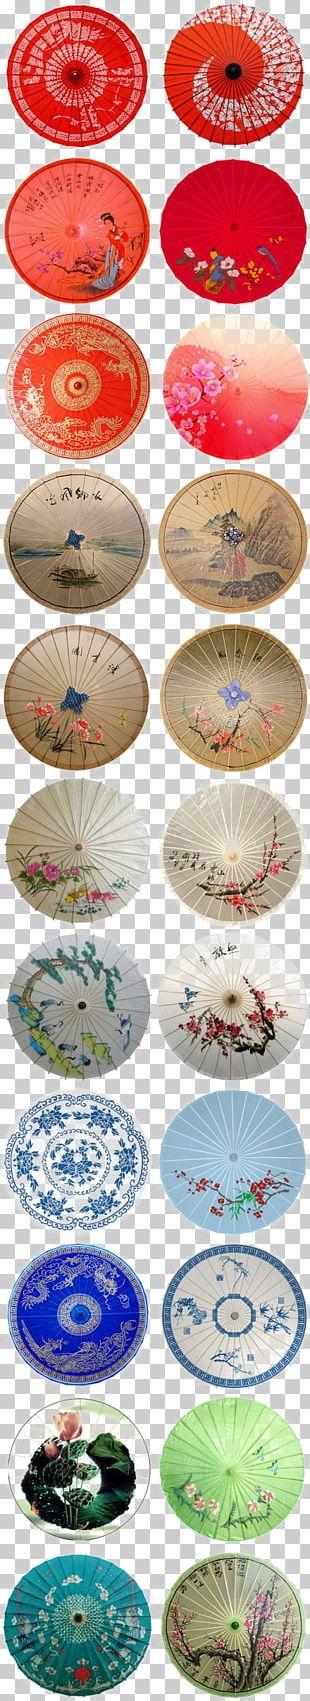 Japanese Art Paper Umbrella Good Citizenship PNG